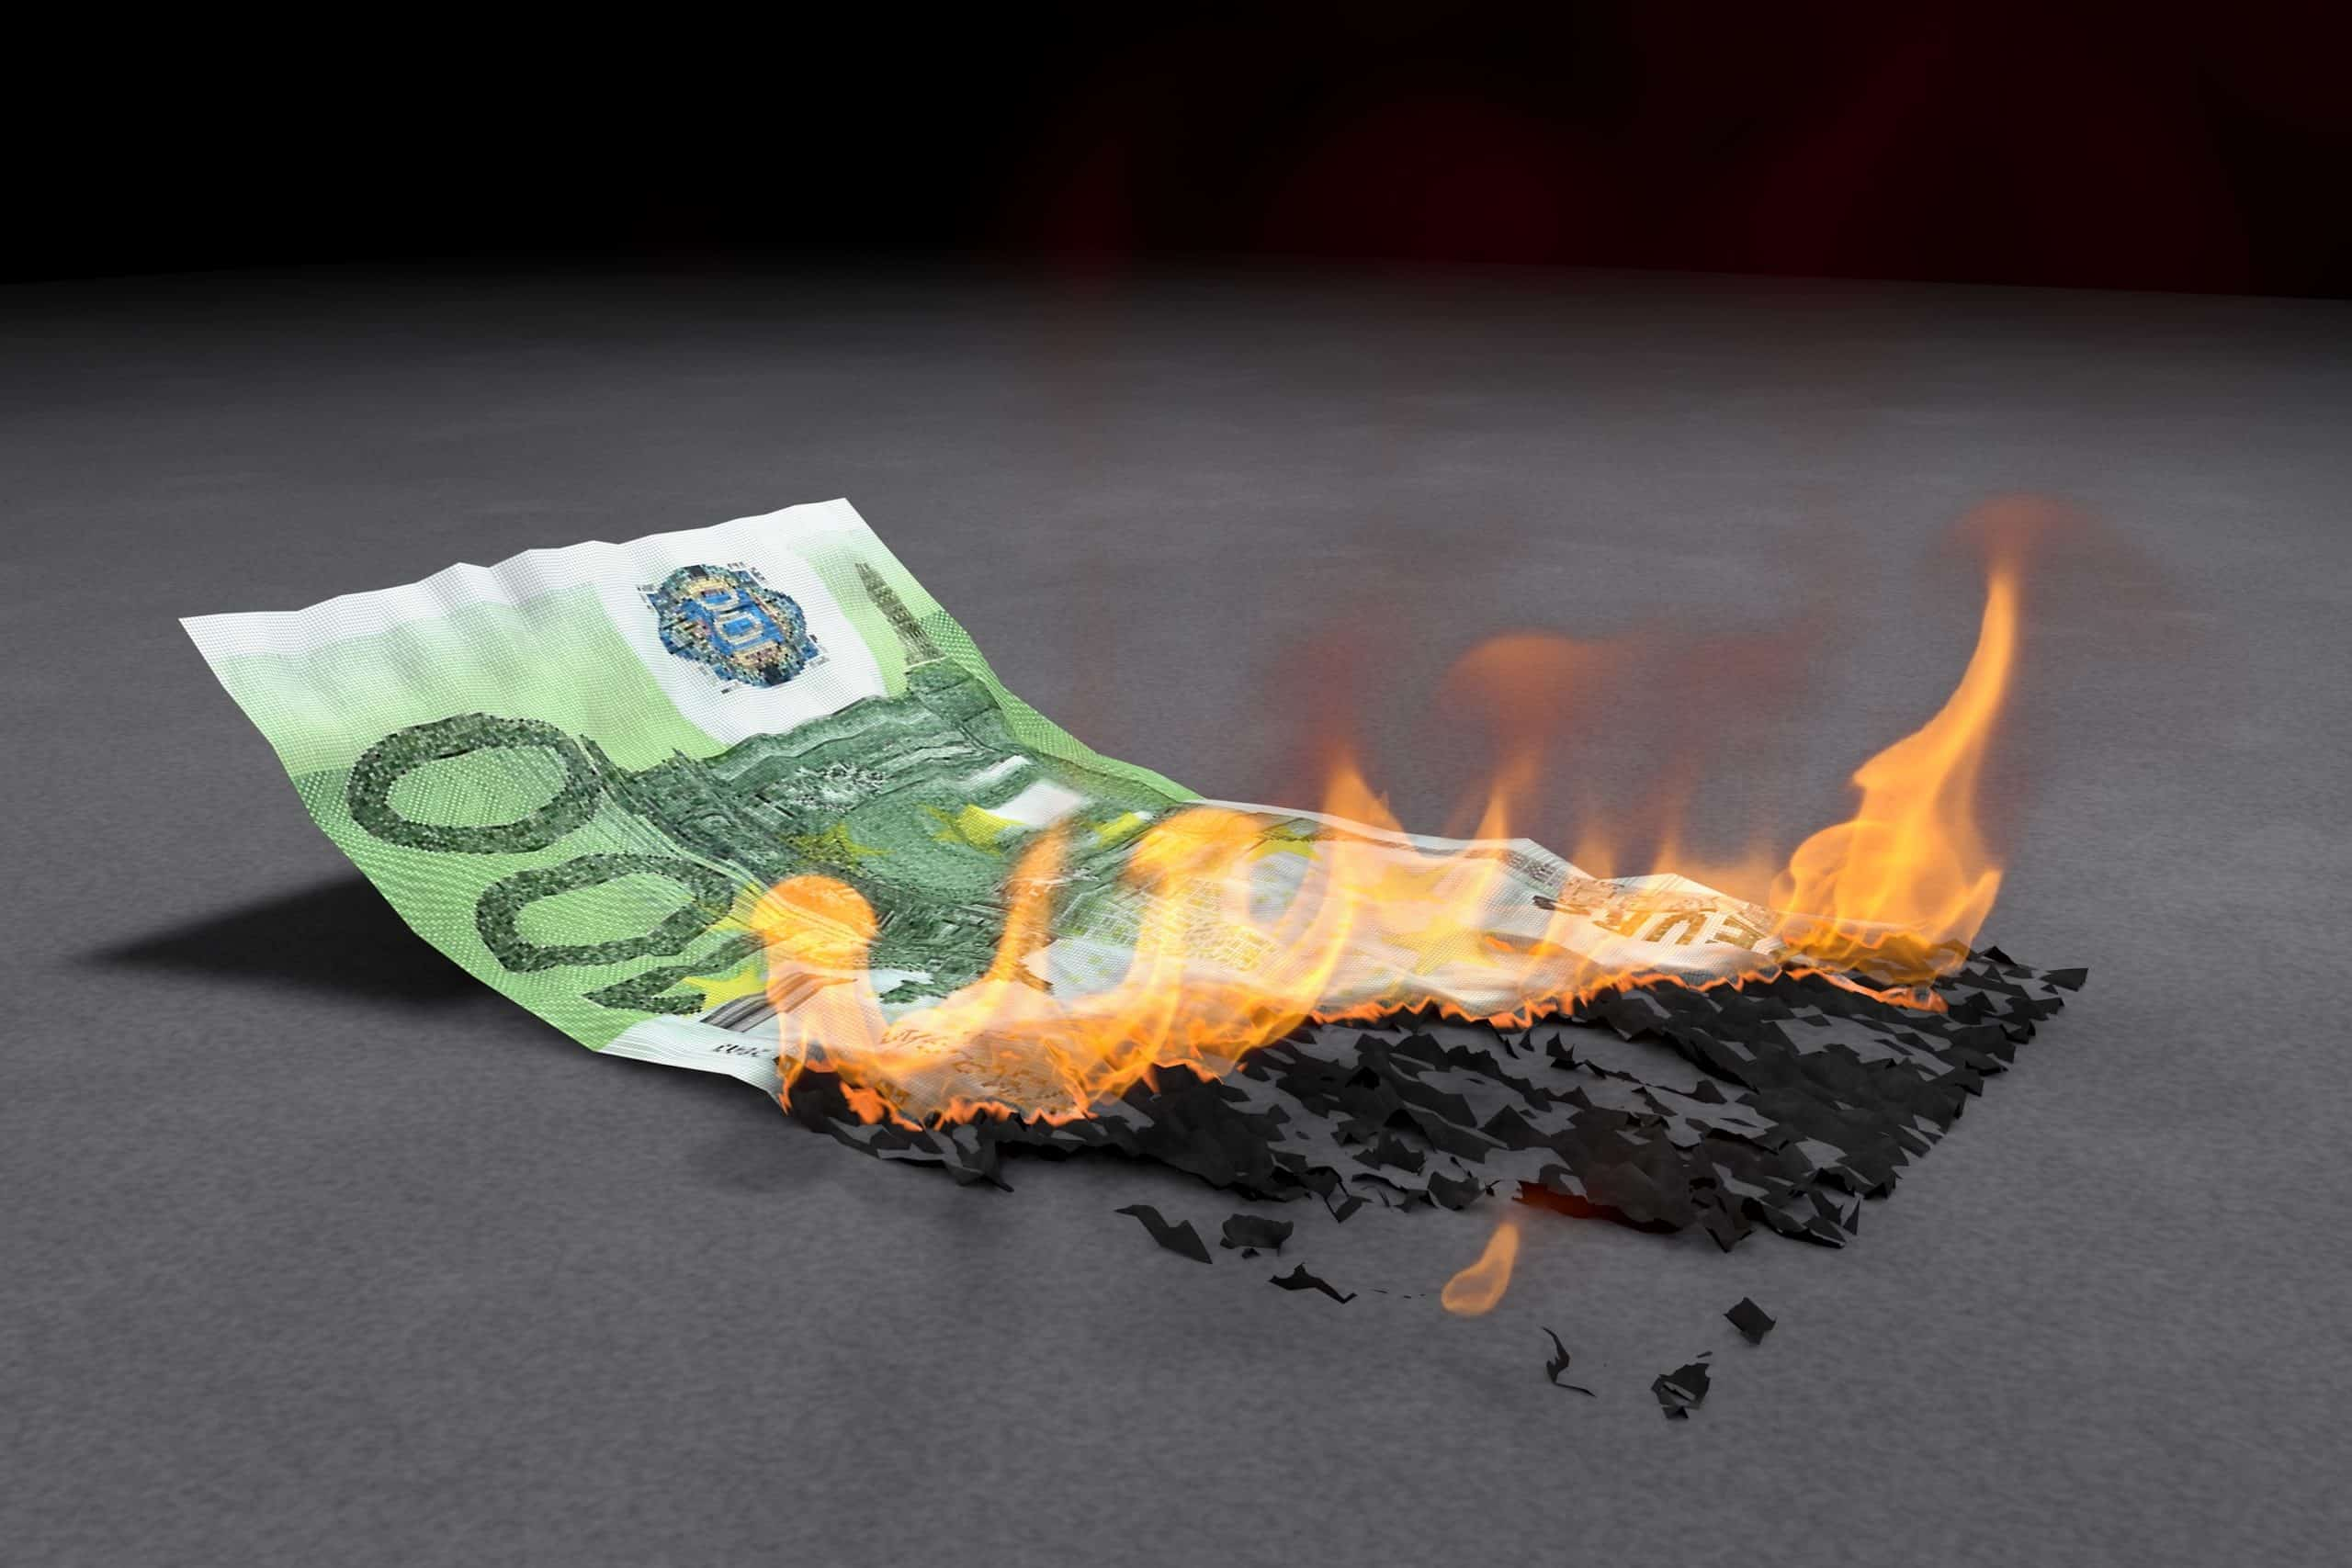 Wir verhindern Geldverbrennung